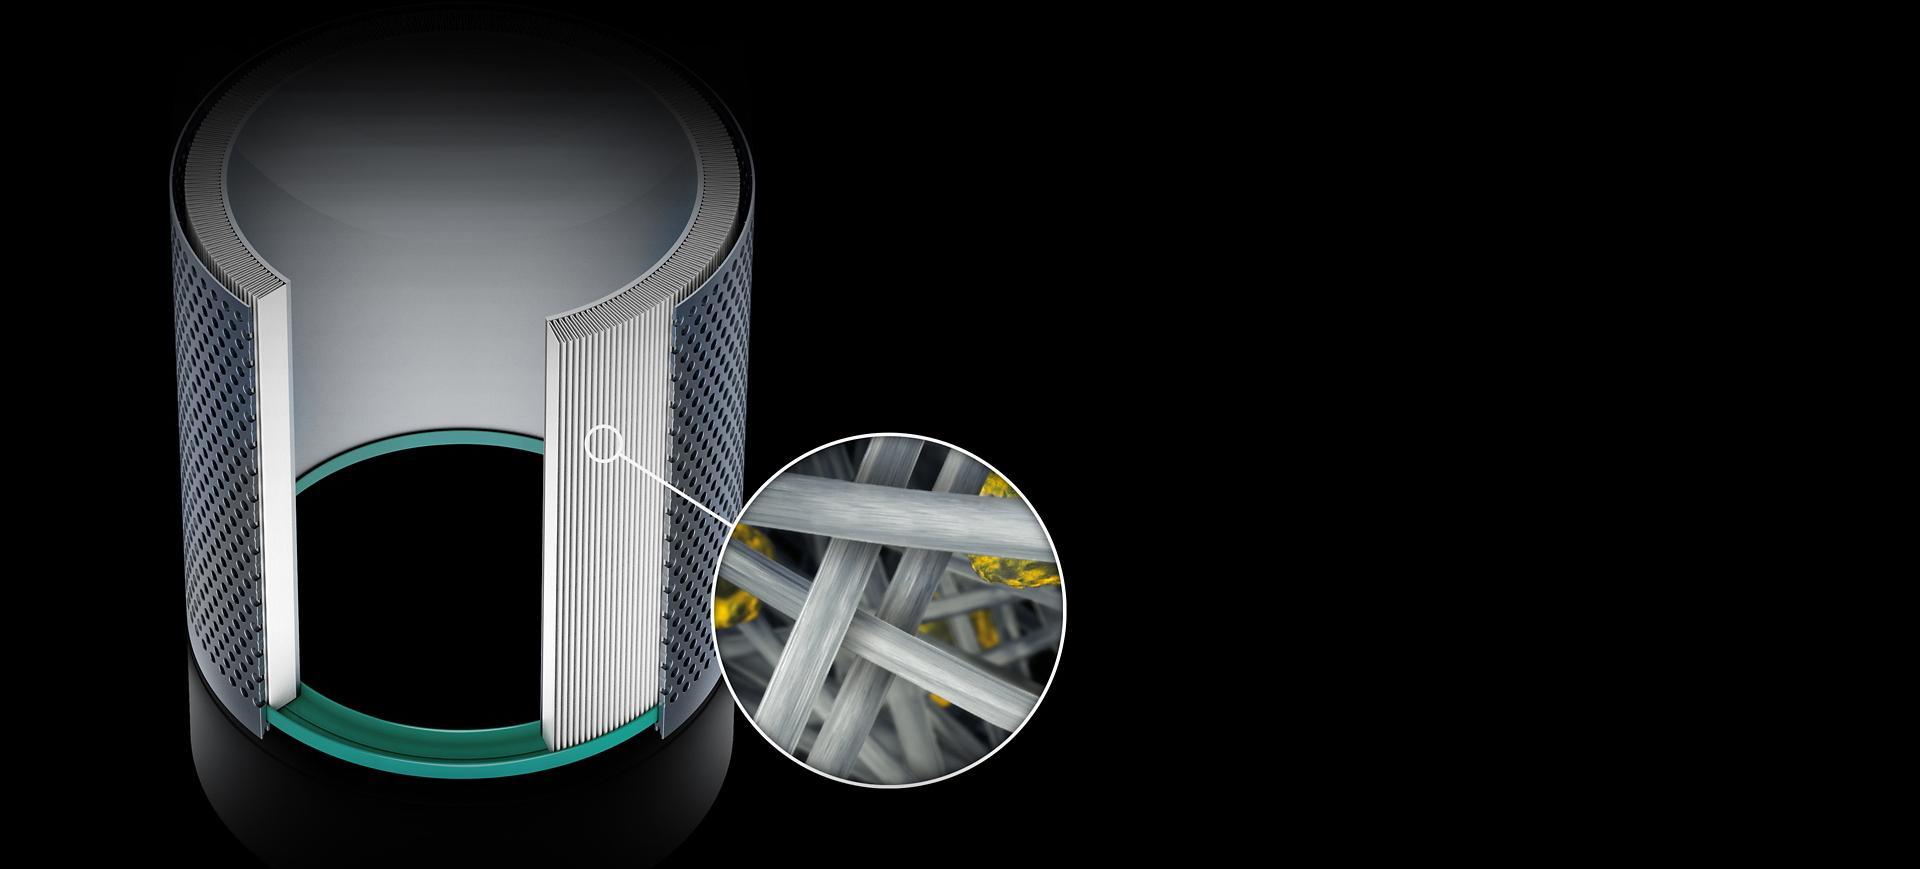 X-ray image inside HEPA borosilicate filter